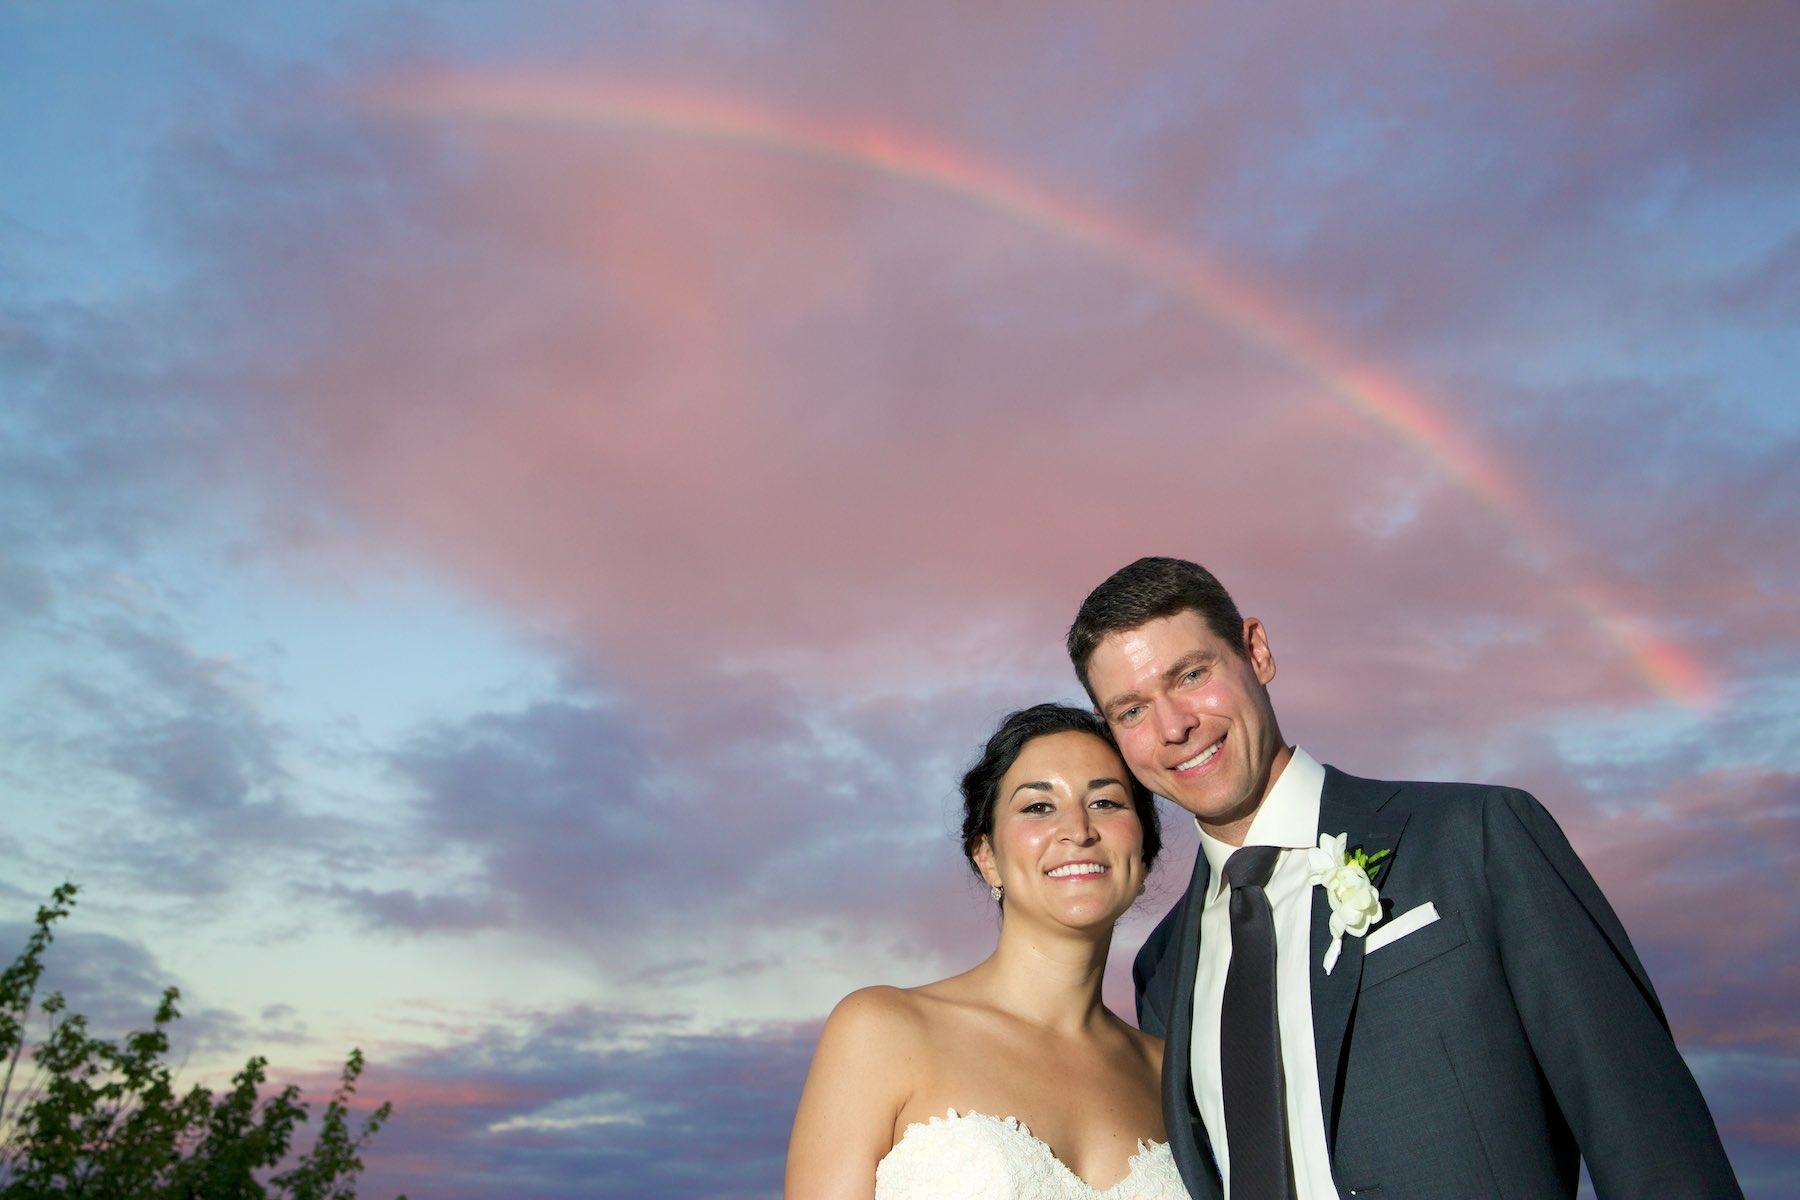 Reacting to a rainbow at sunset, a quick portrait of Emi & Daniel on balcony during wedding reception at Geneva National Golf Club in Lake Geneva, Wisconsin. Wedding photography by Steve & Tiffany Warmowski.